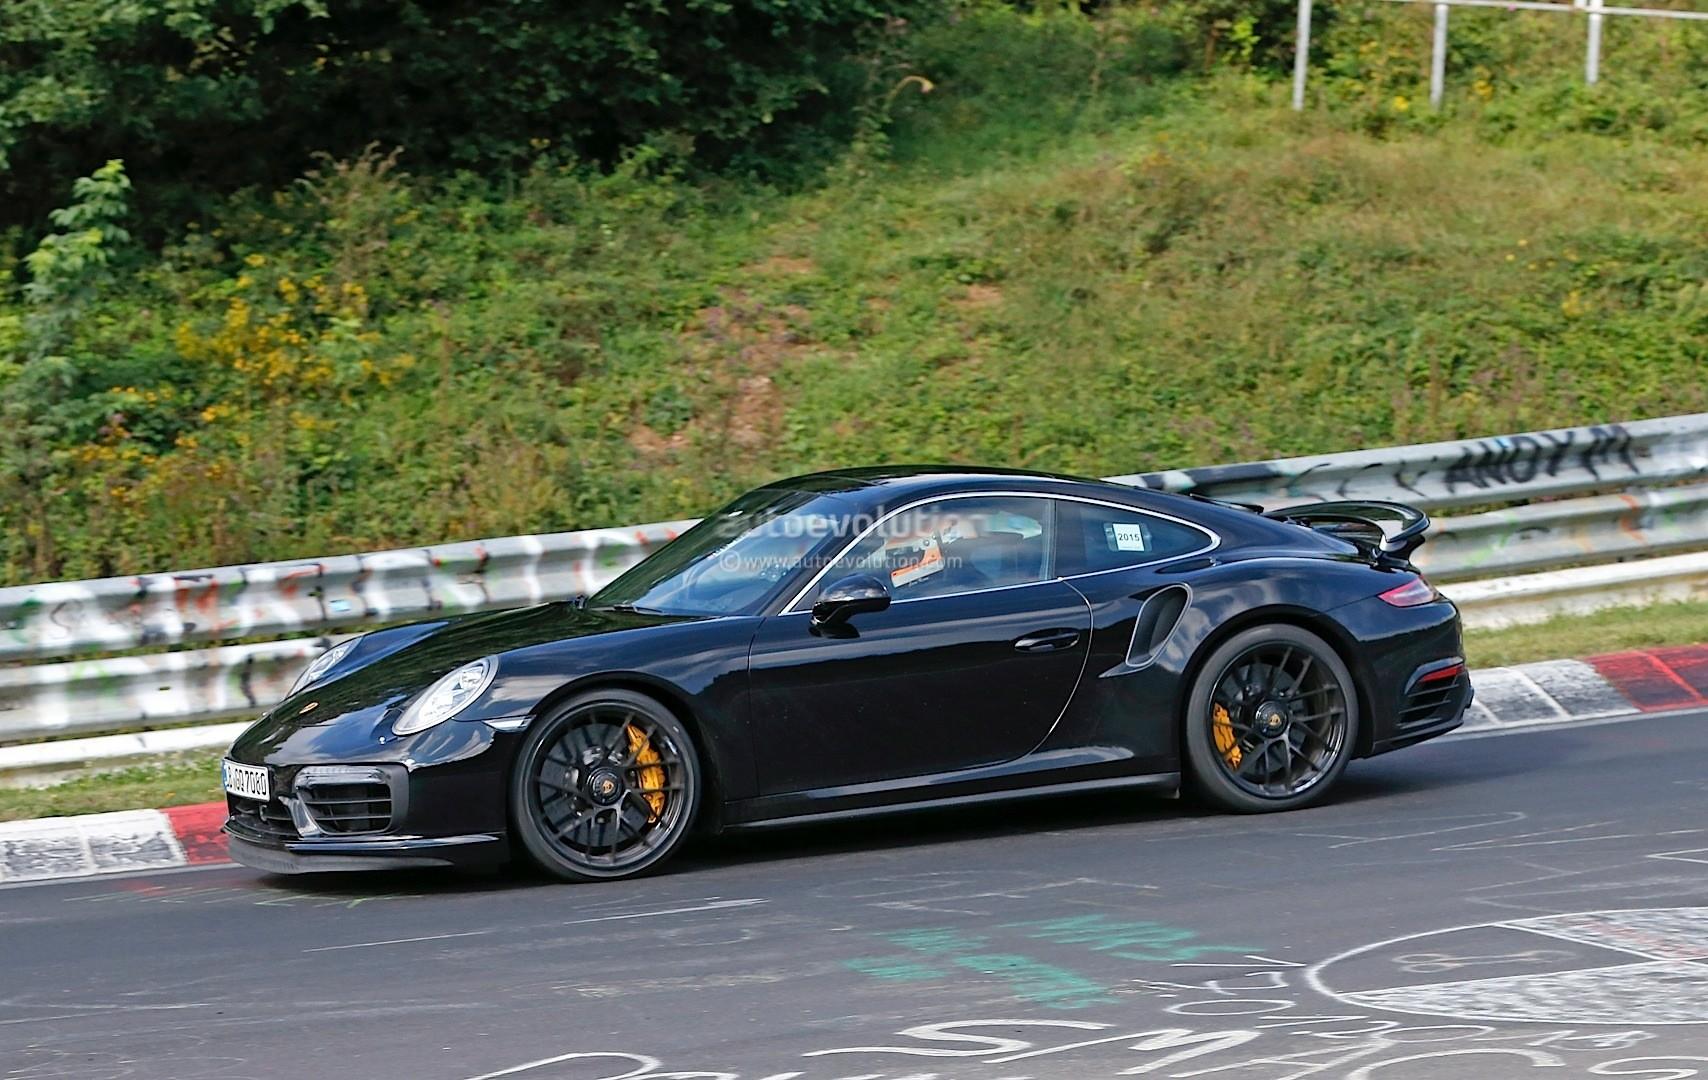 2016 porsche 911 facelift gt3 gts skip turbos carrera s gets 4 wheel. Black Bedroom Furniture Sets. Home Design Ideas